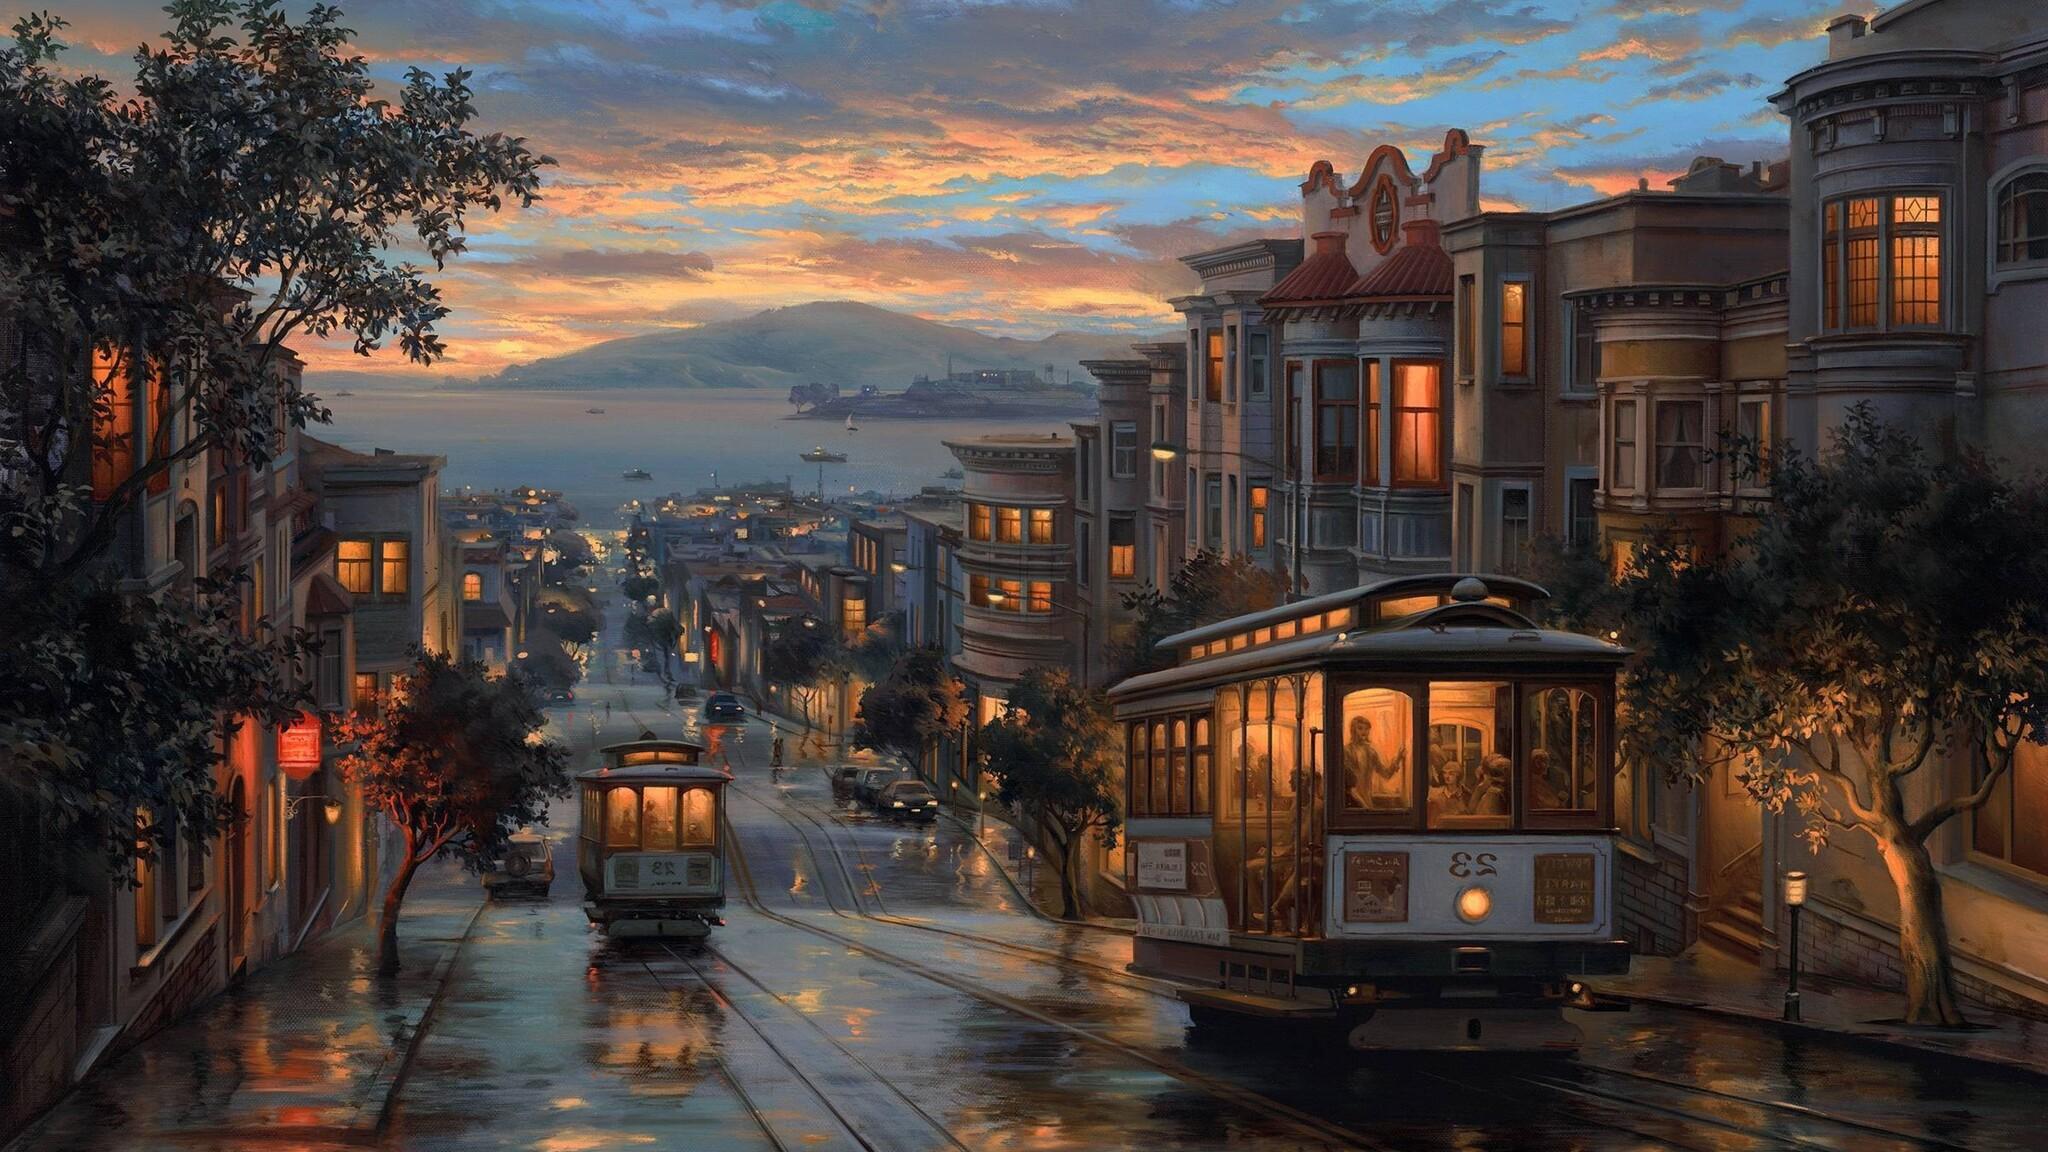 2048x1152 Rainy Night Artistic Painting 2048x1152